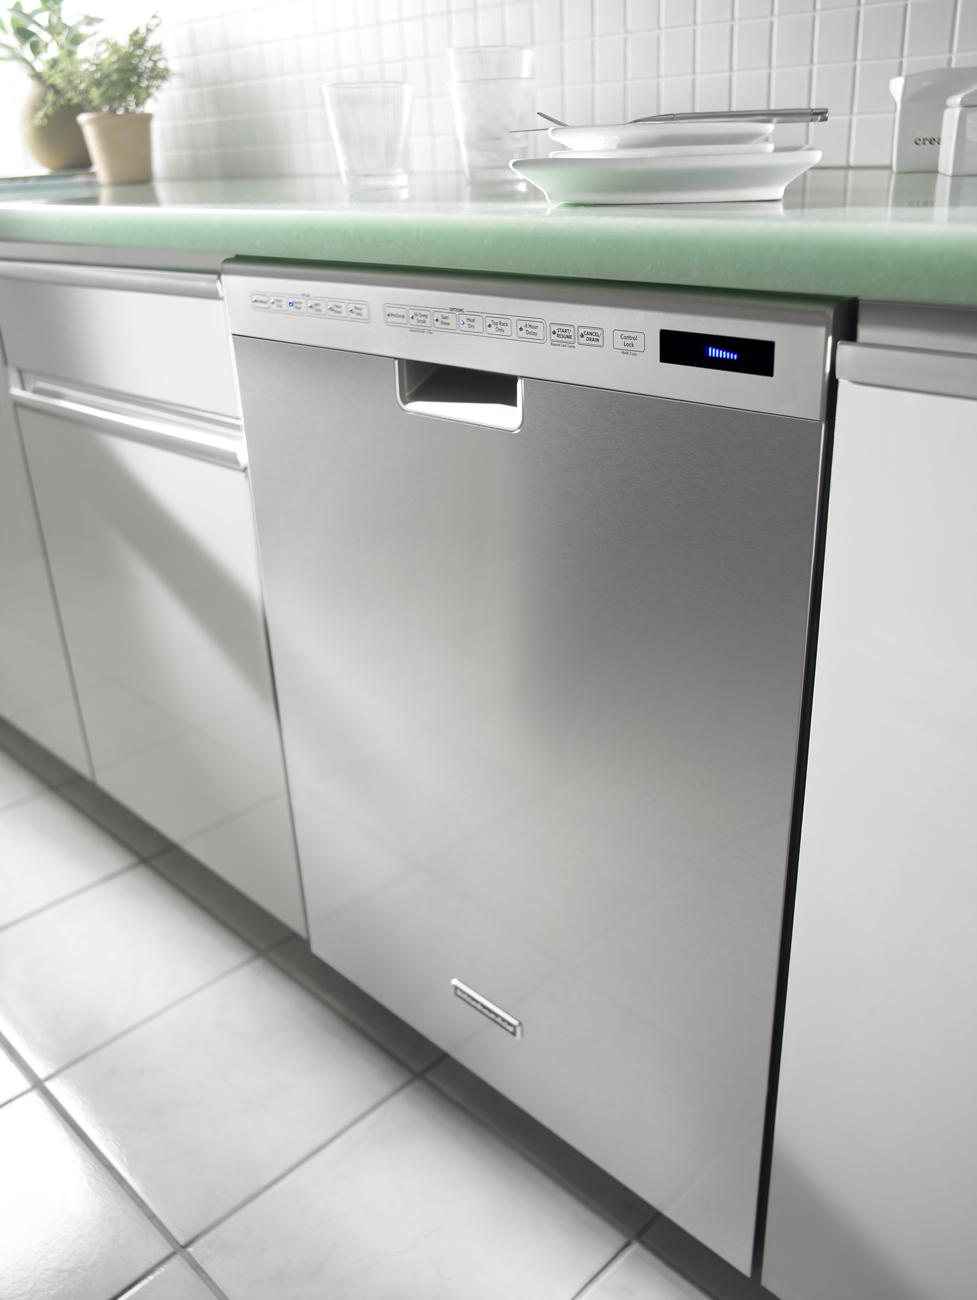 Kude50cxss kitchenaid kude50cxss superba series - Kitchenaid dishwasher not cleaning top rack ...